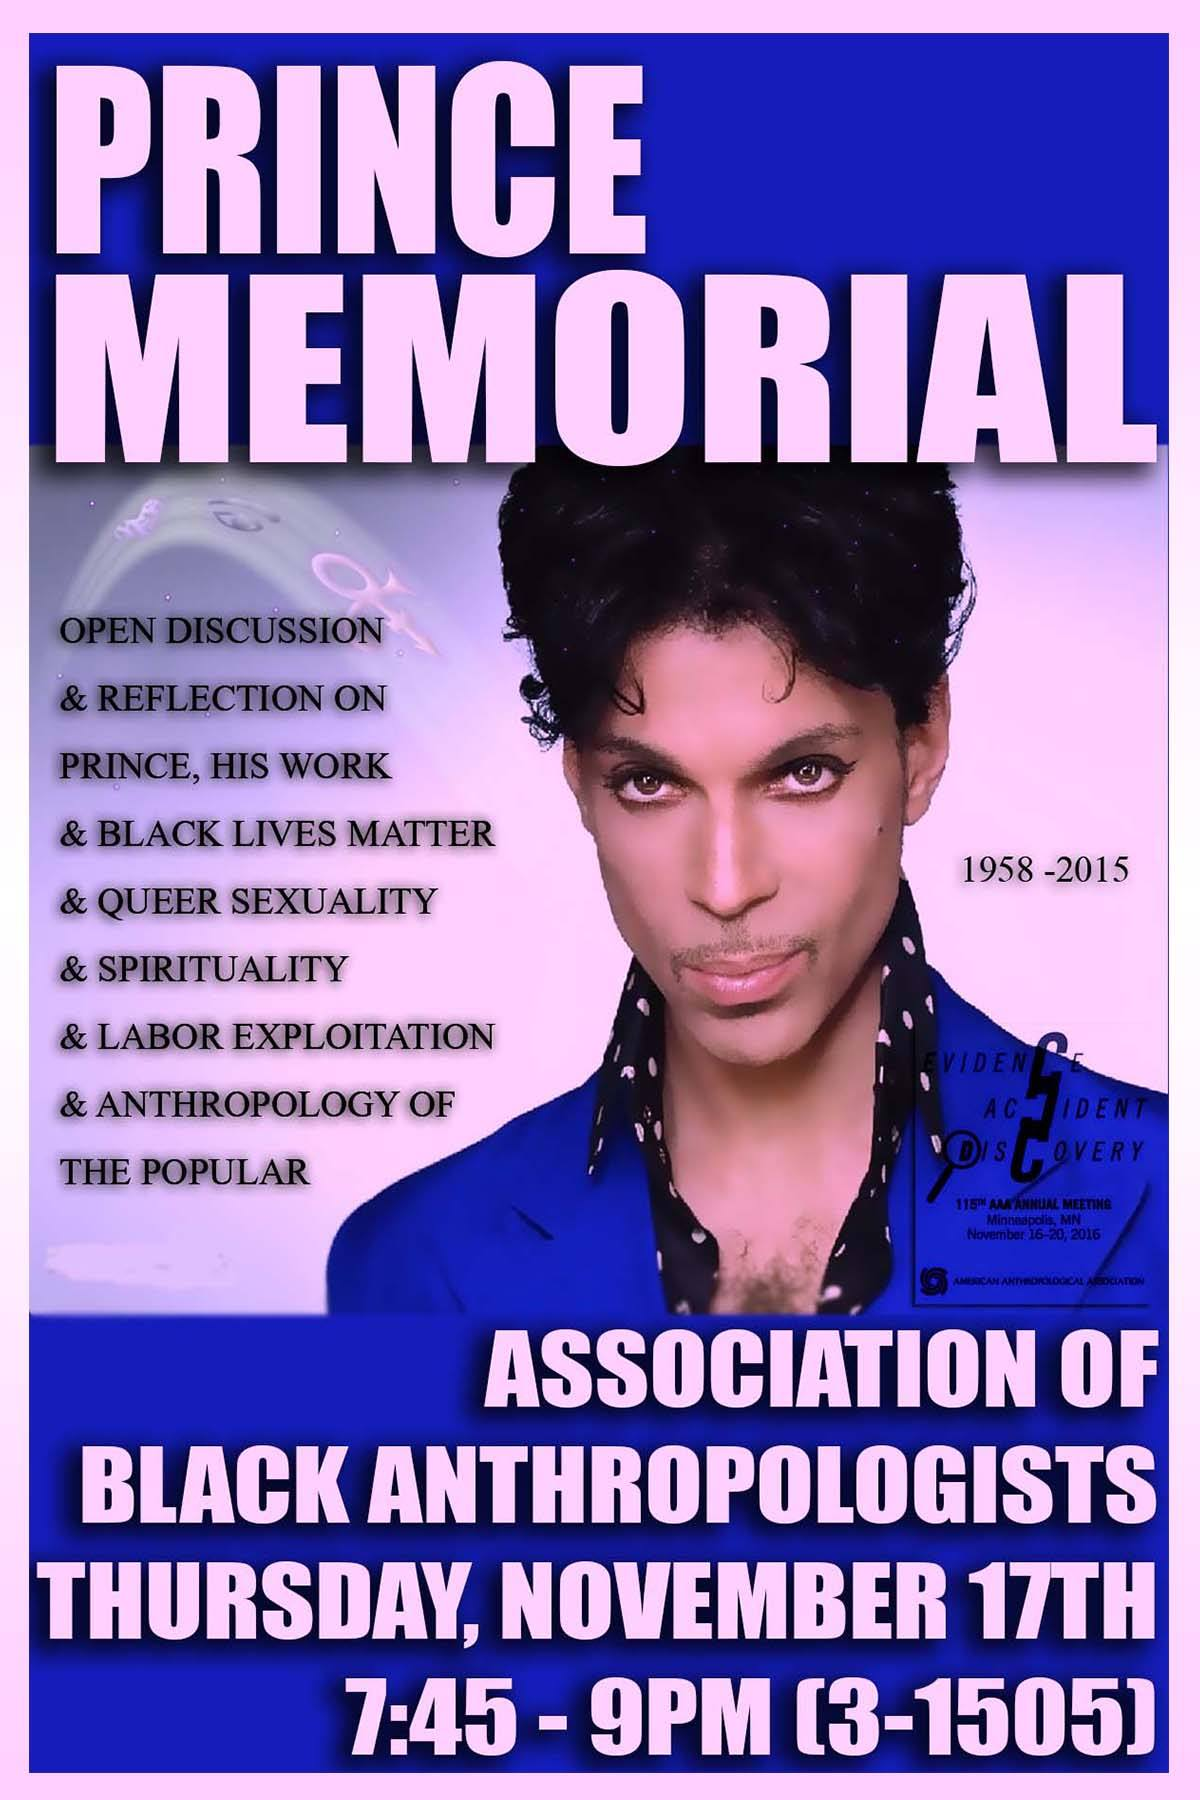 prince-memorial-aaa2016